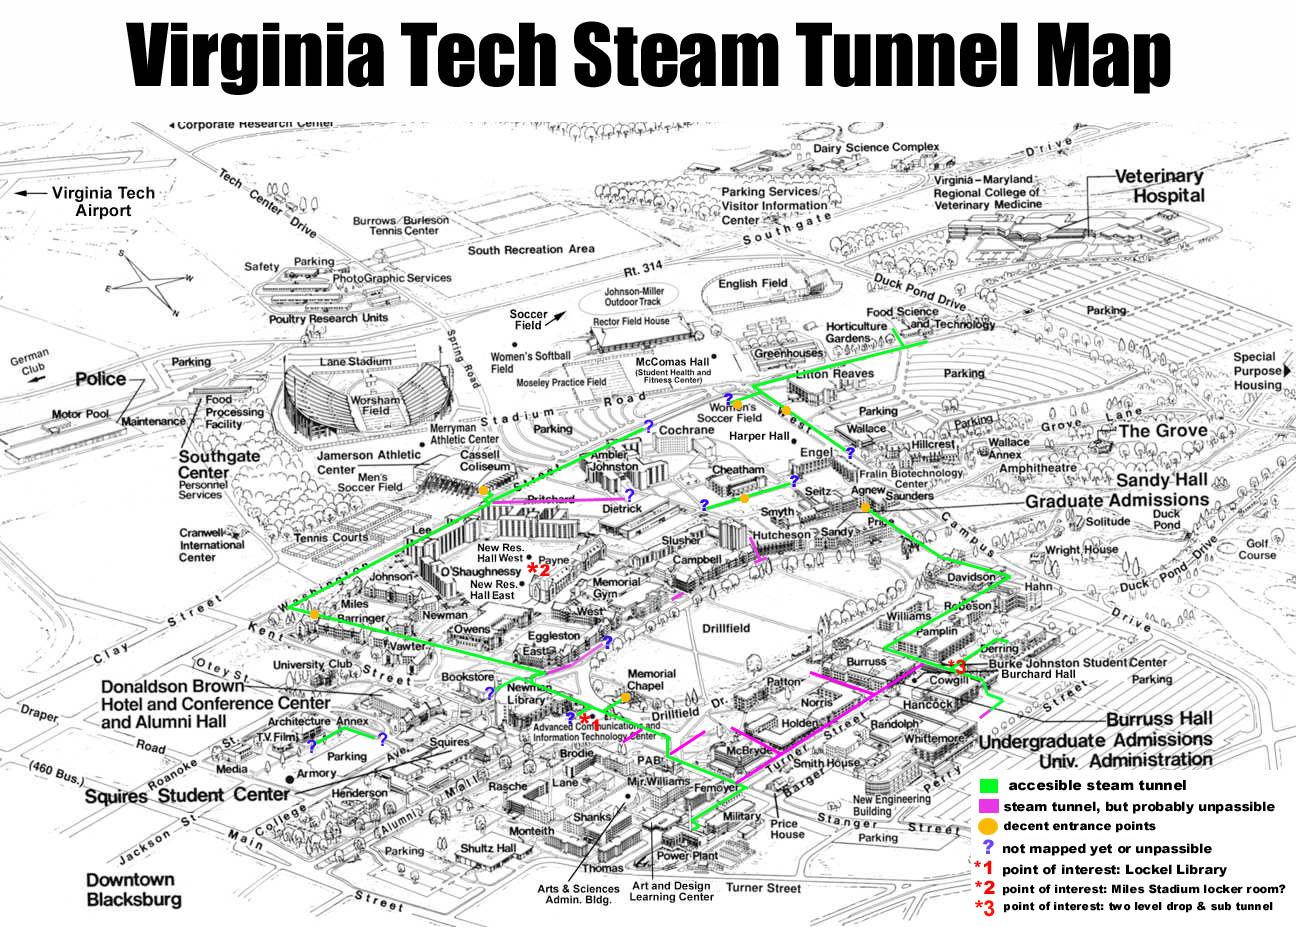 Virginia Tech Urban Exploration Tunnel Entrances Exits